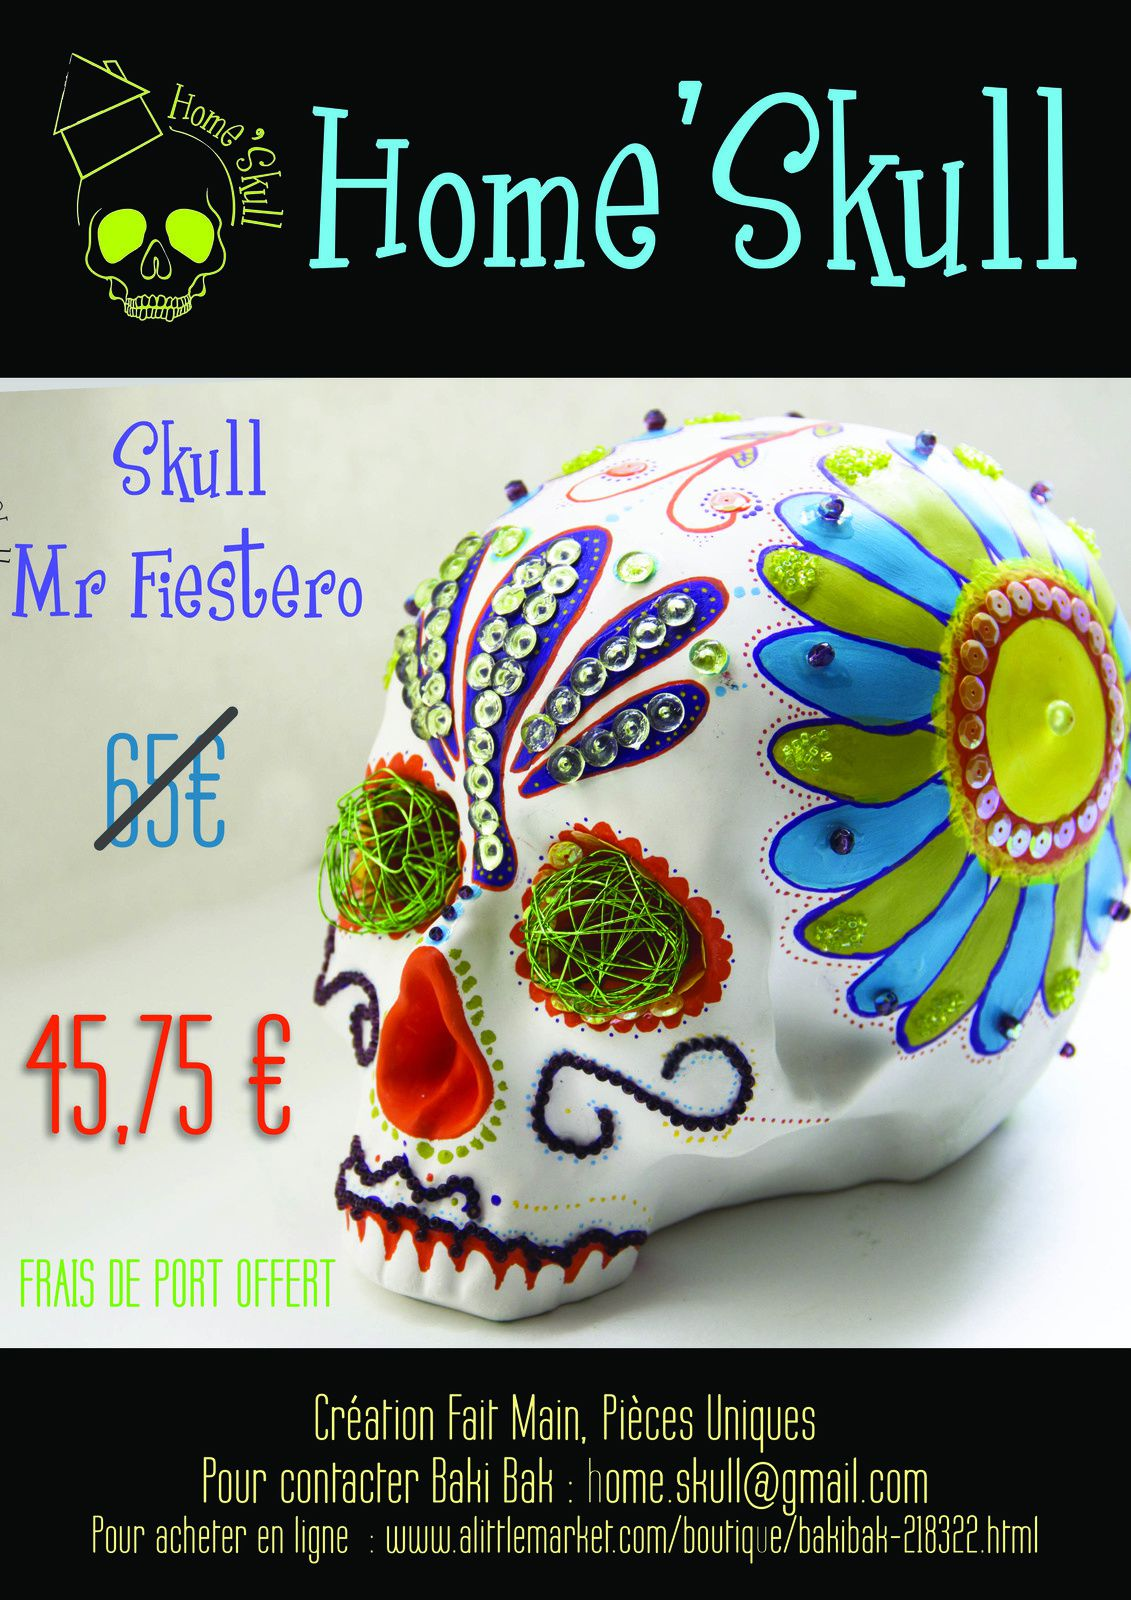 Pub Home'Skull